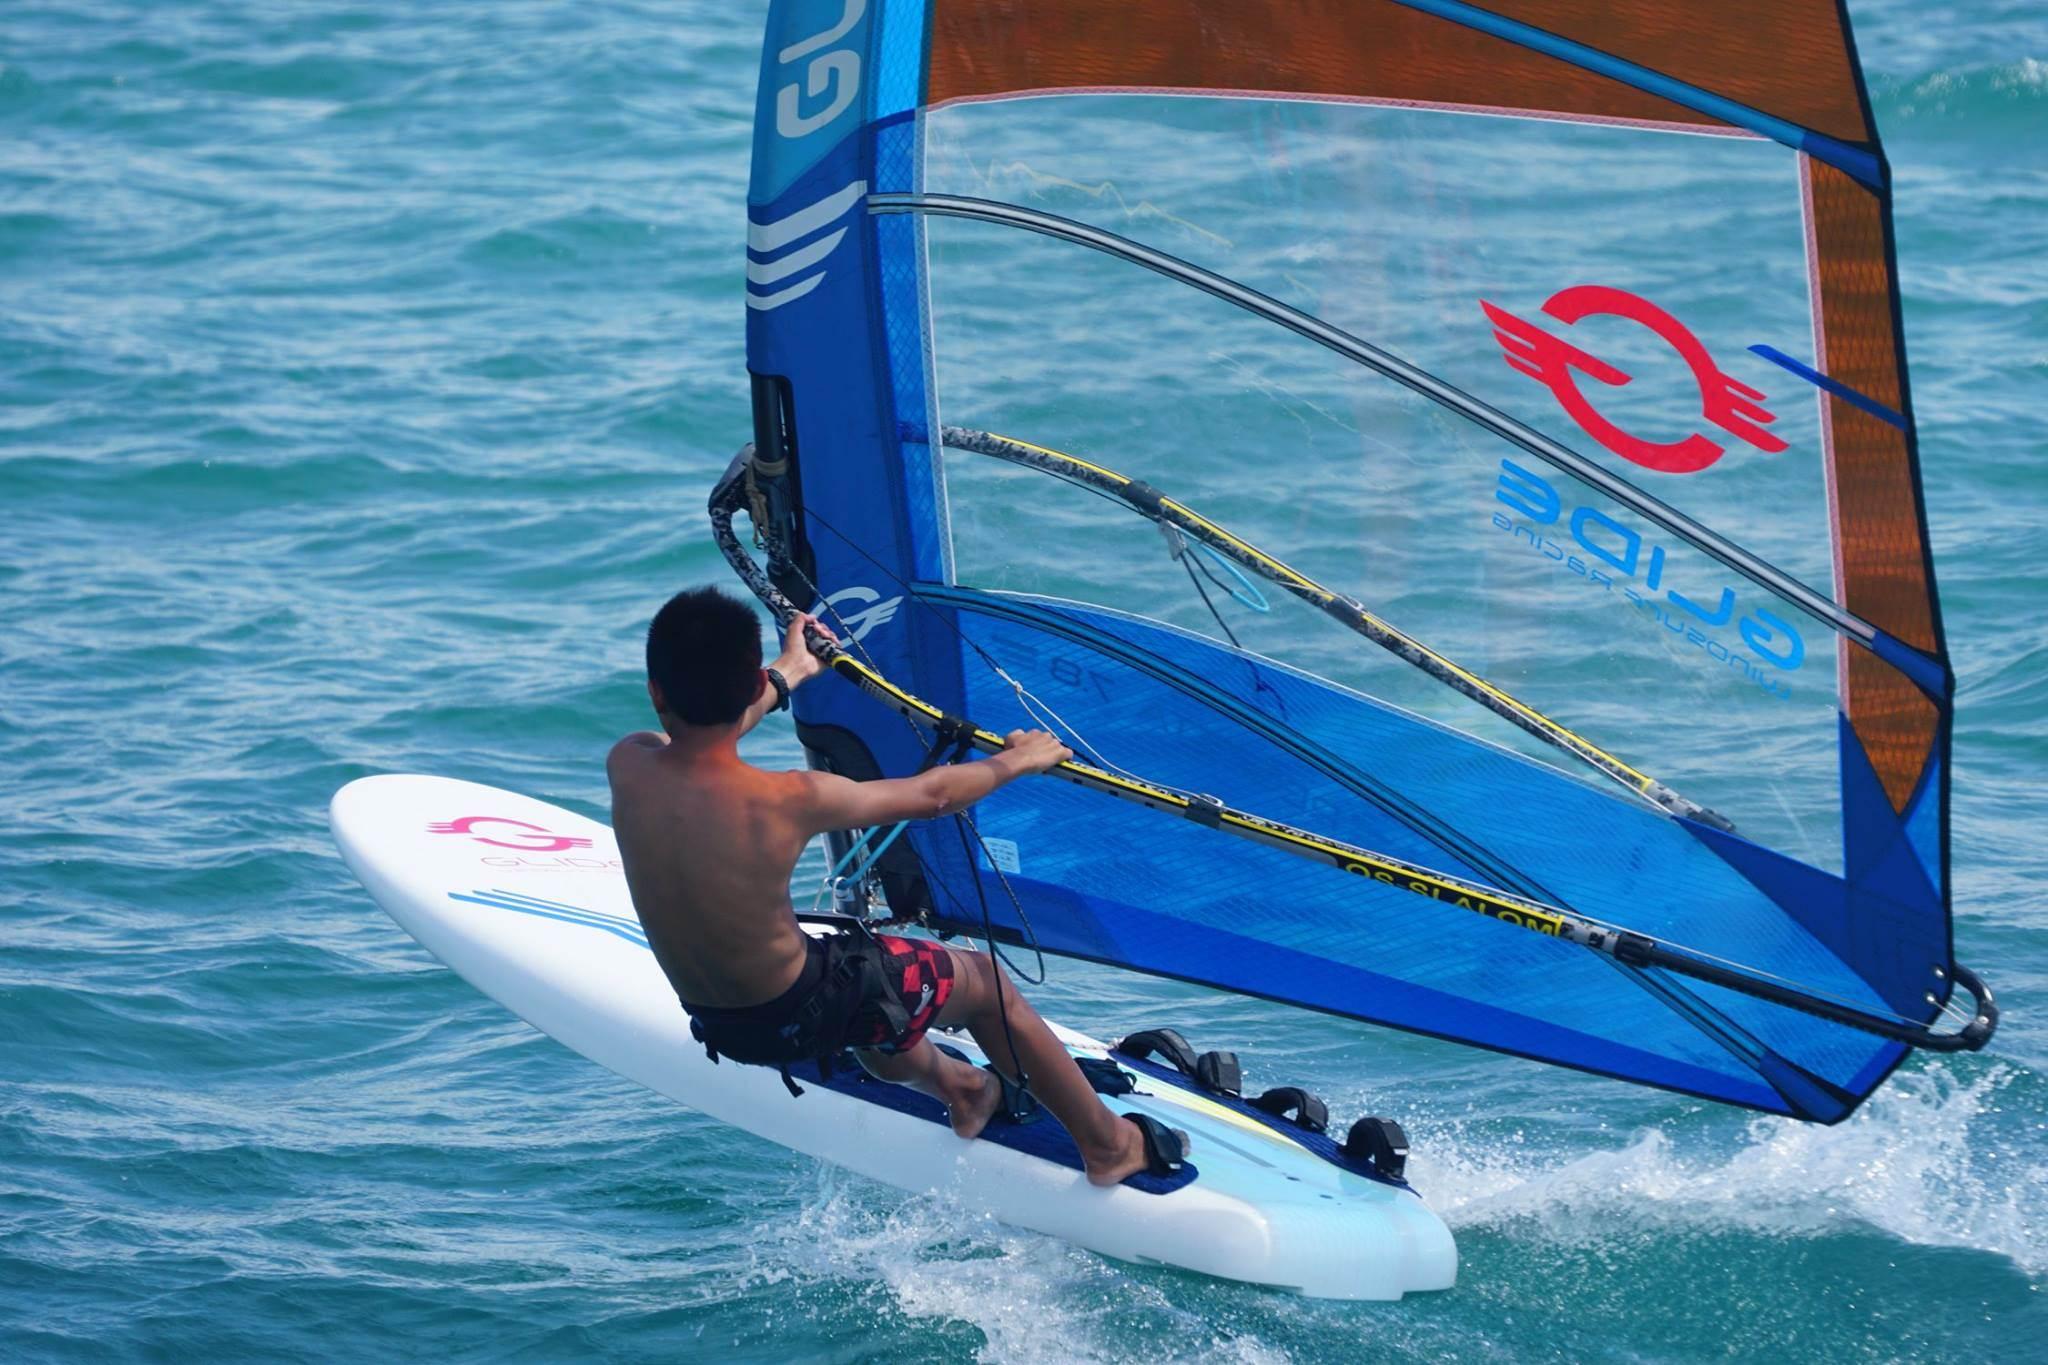 bruce-kendall-glide-windsurfer.jpg